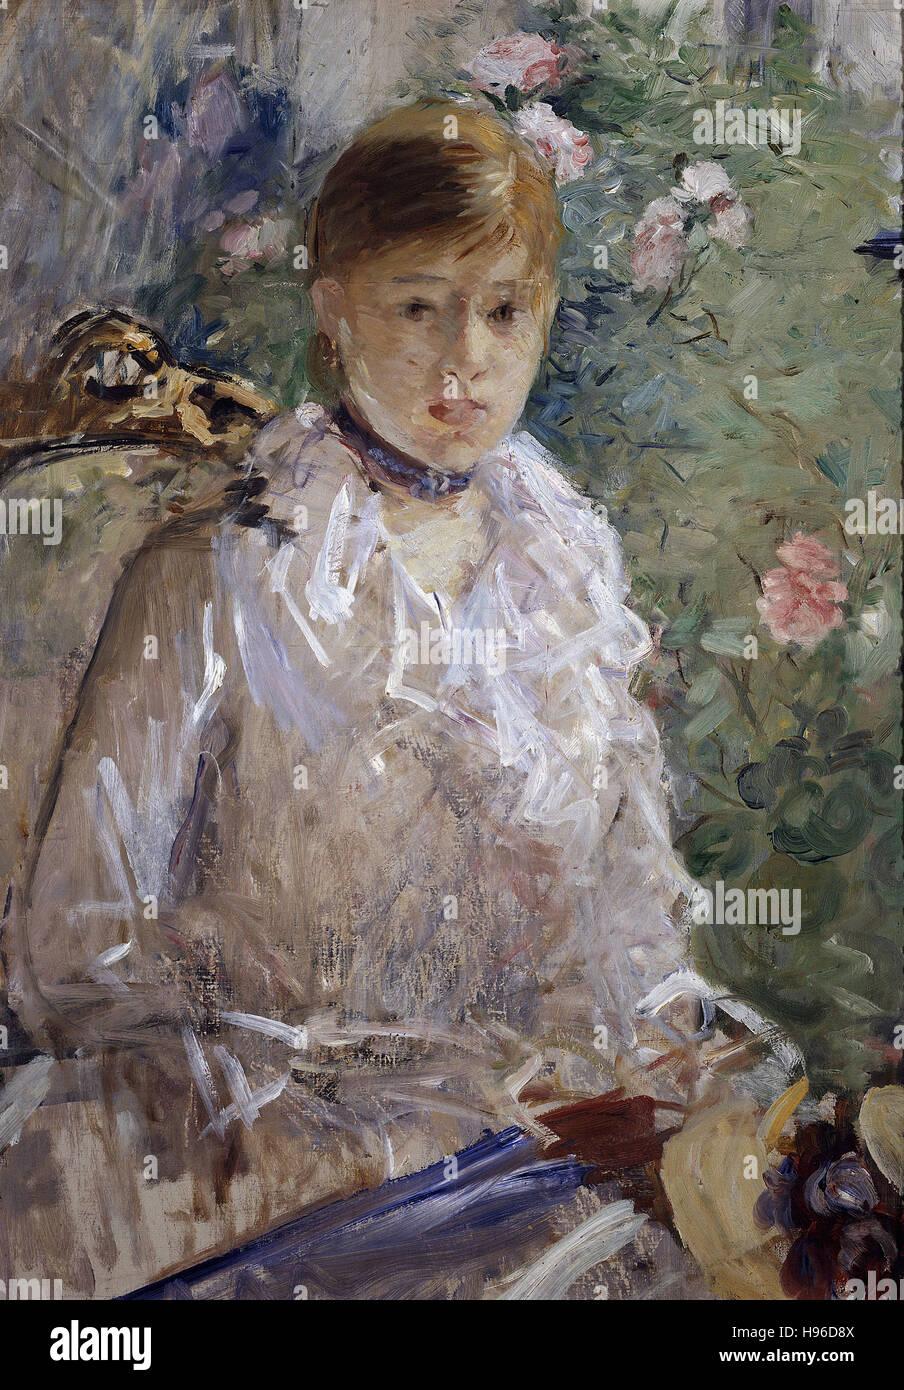 Berthe Morisot - Estate - 1880 - Immagini Stock